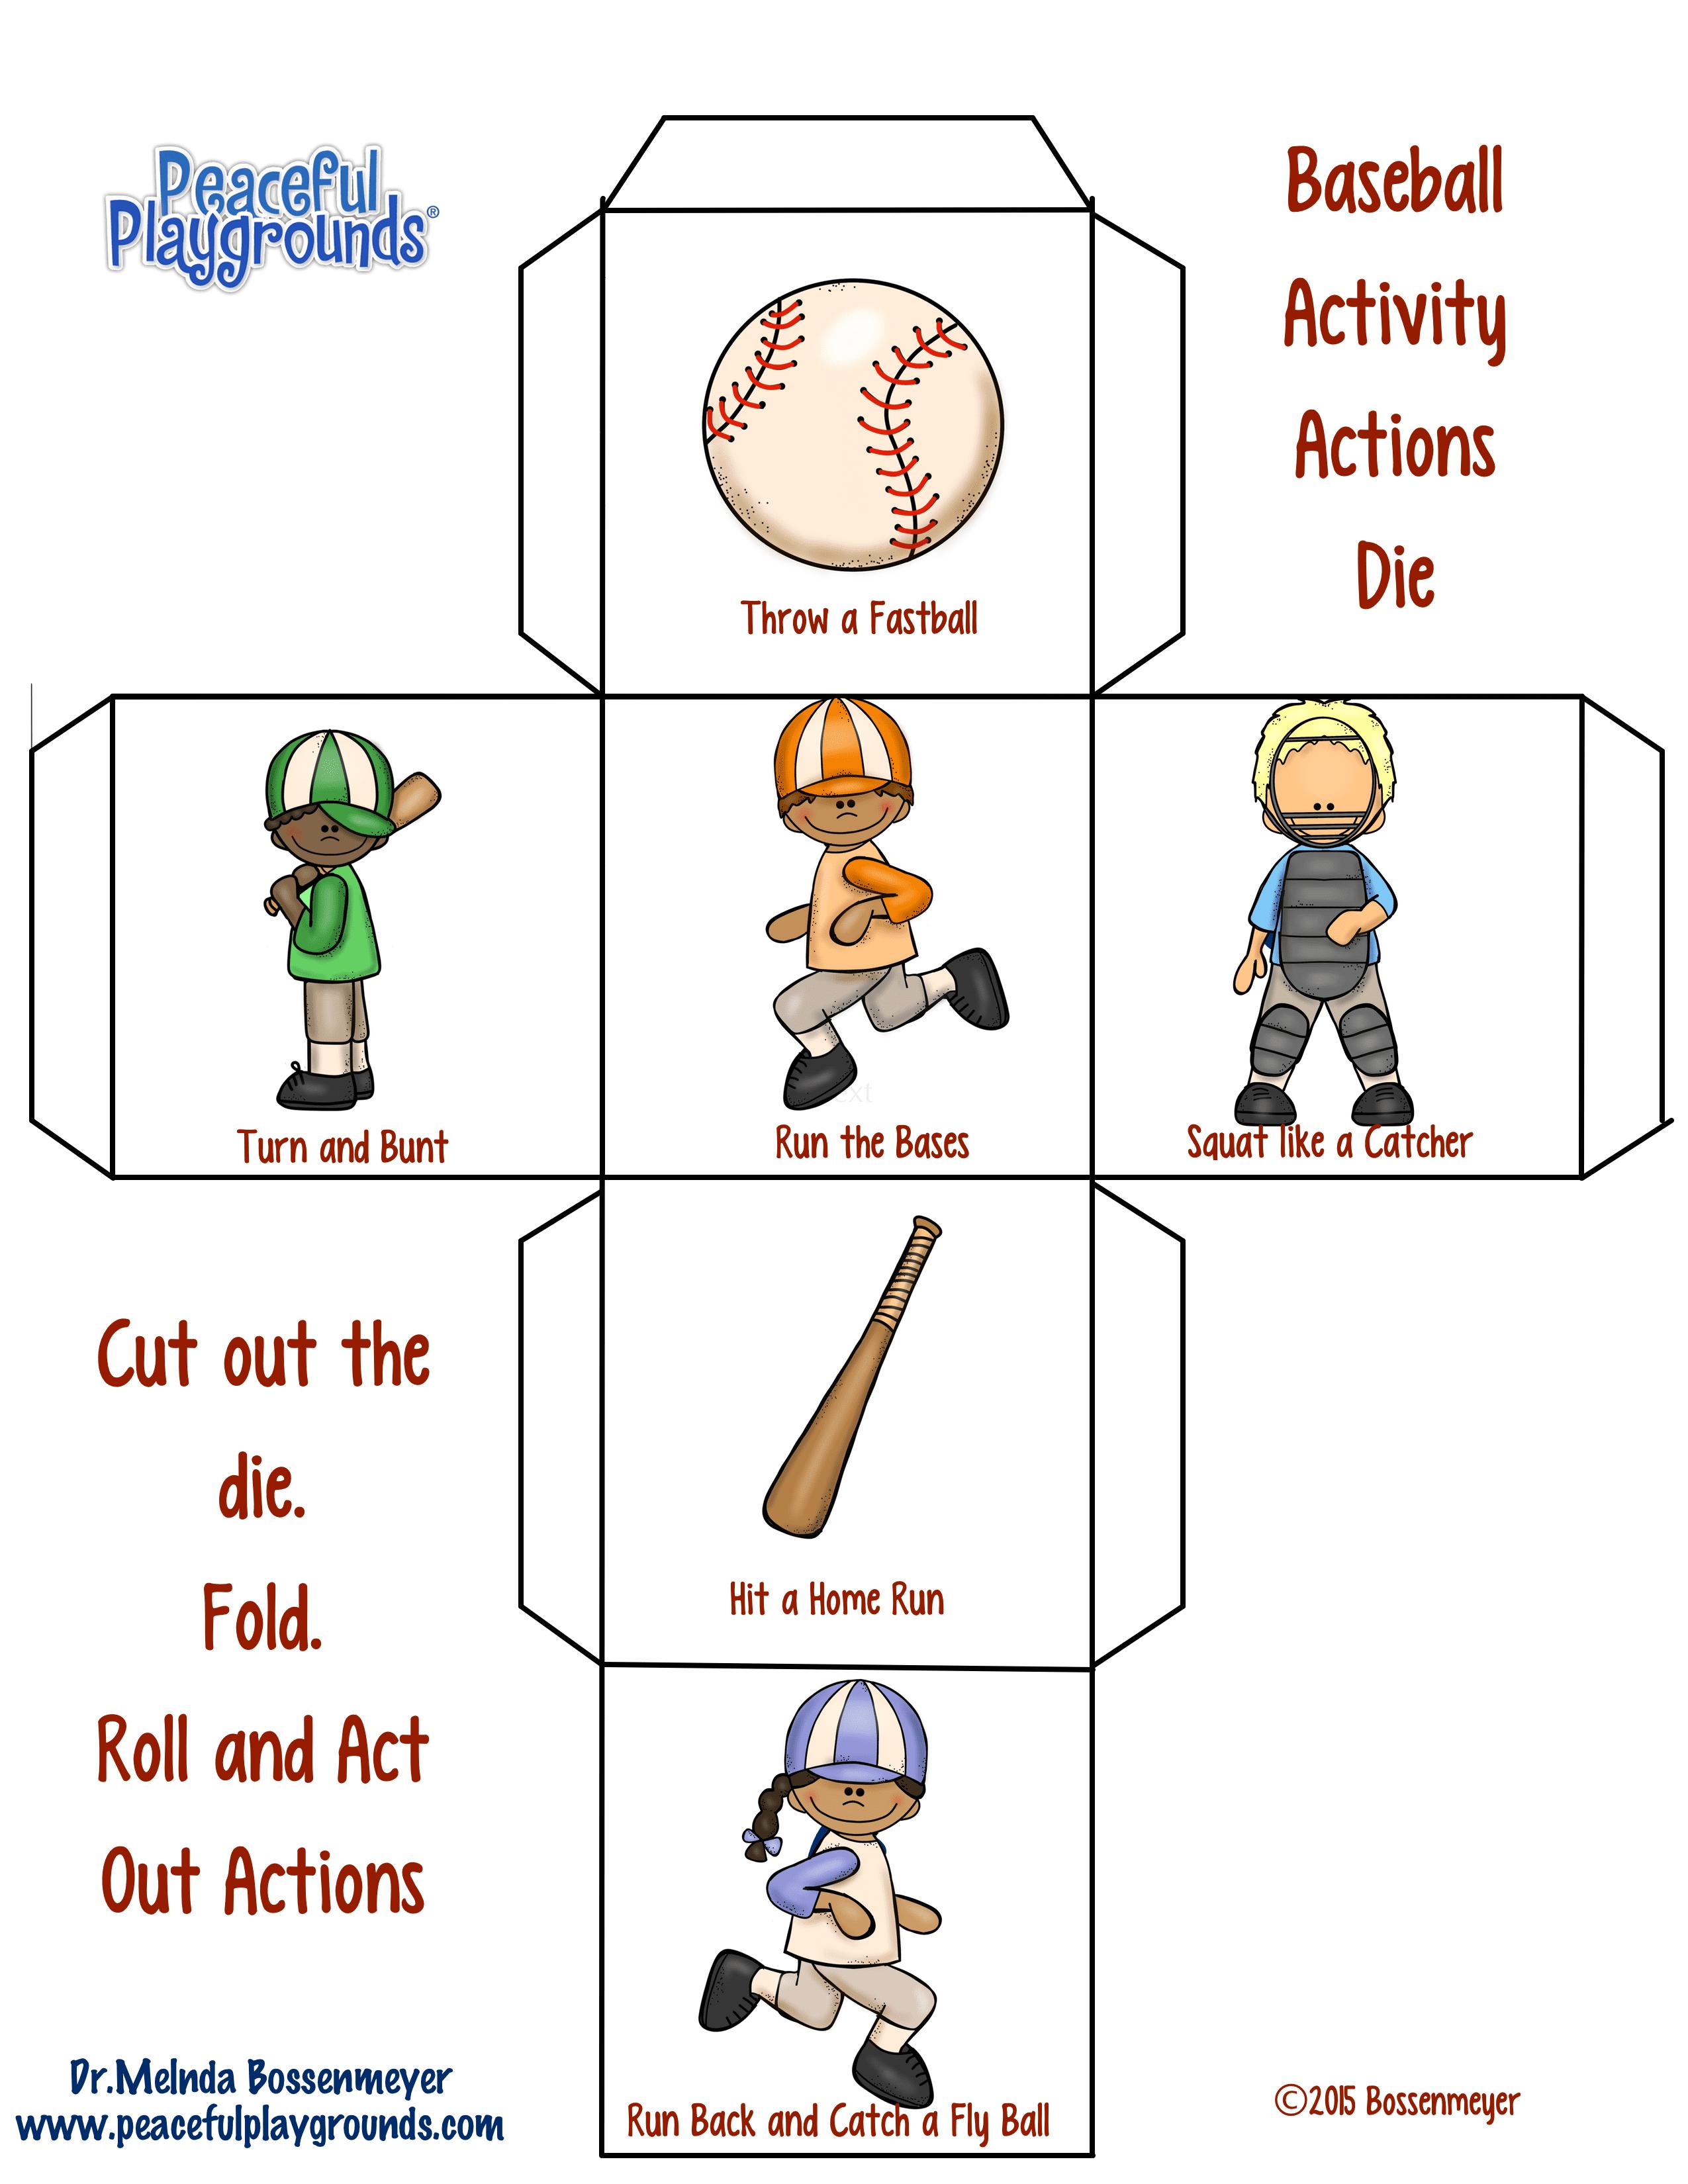 Baseball activity dice